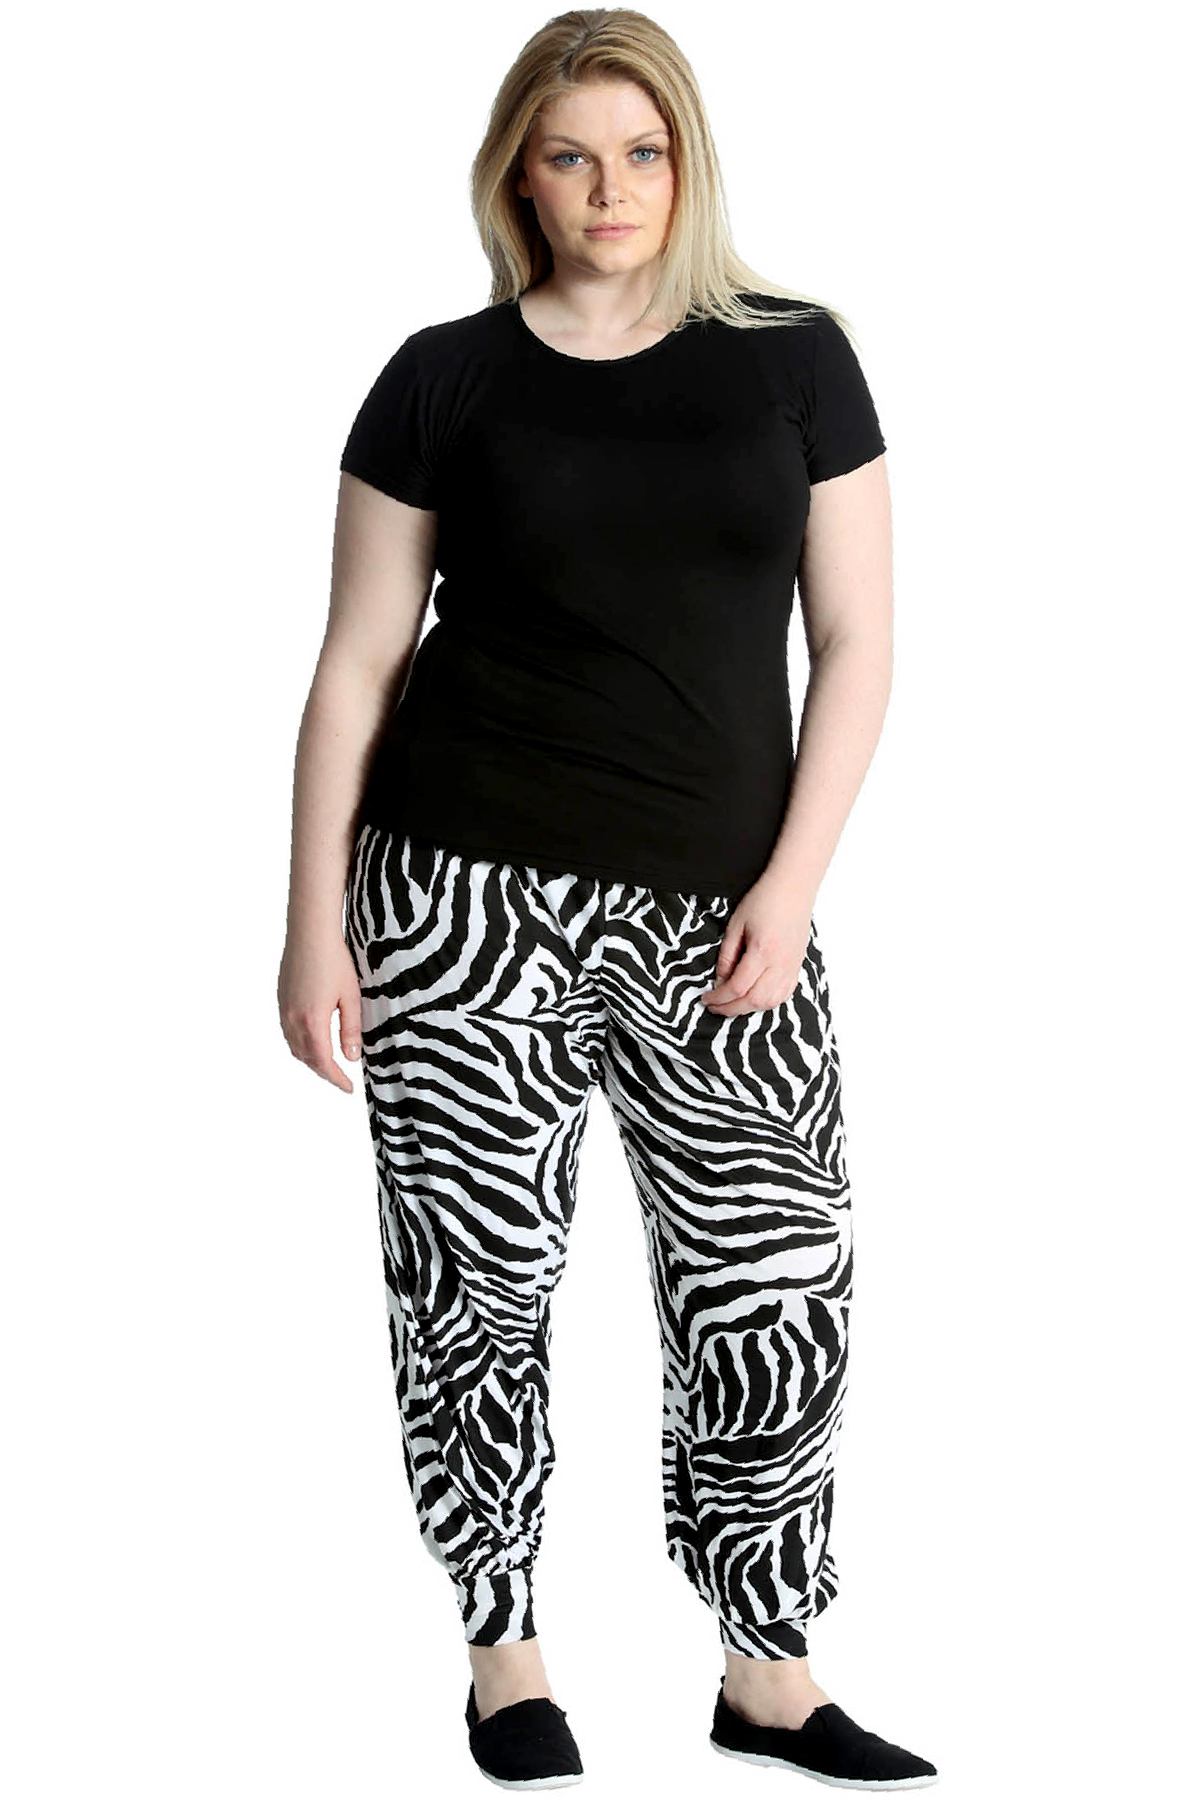 New Womens Plus Size Trouser Ladies Harem Zebra Animal Print Ali Baba Nouvelle